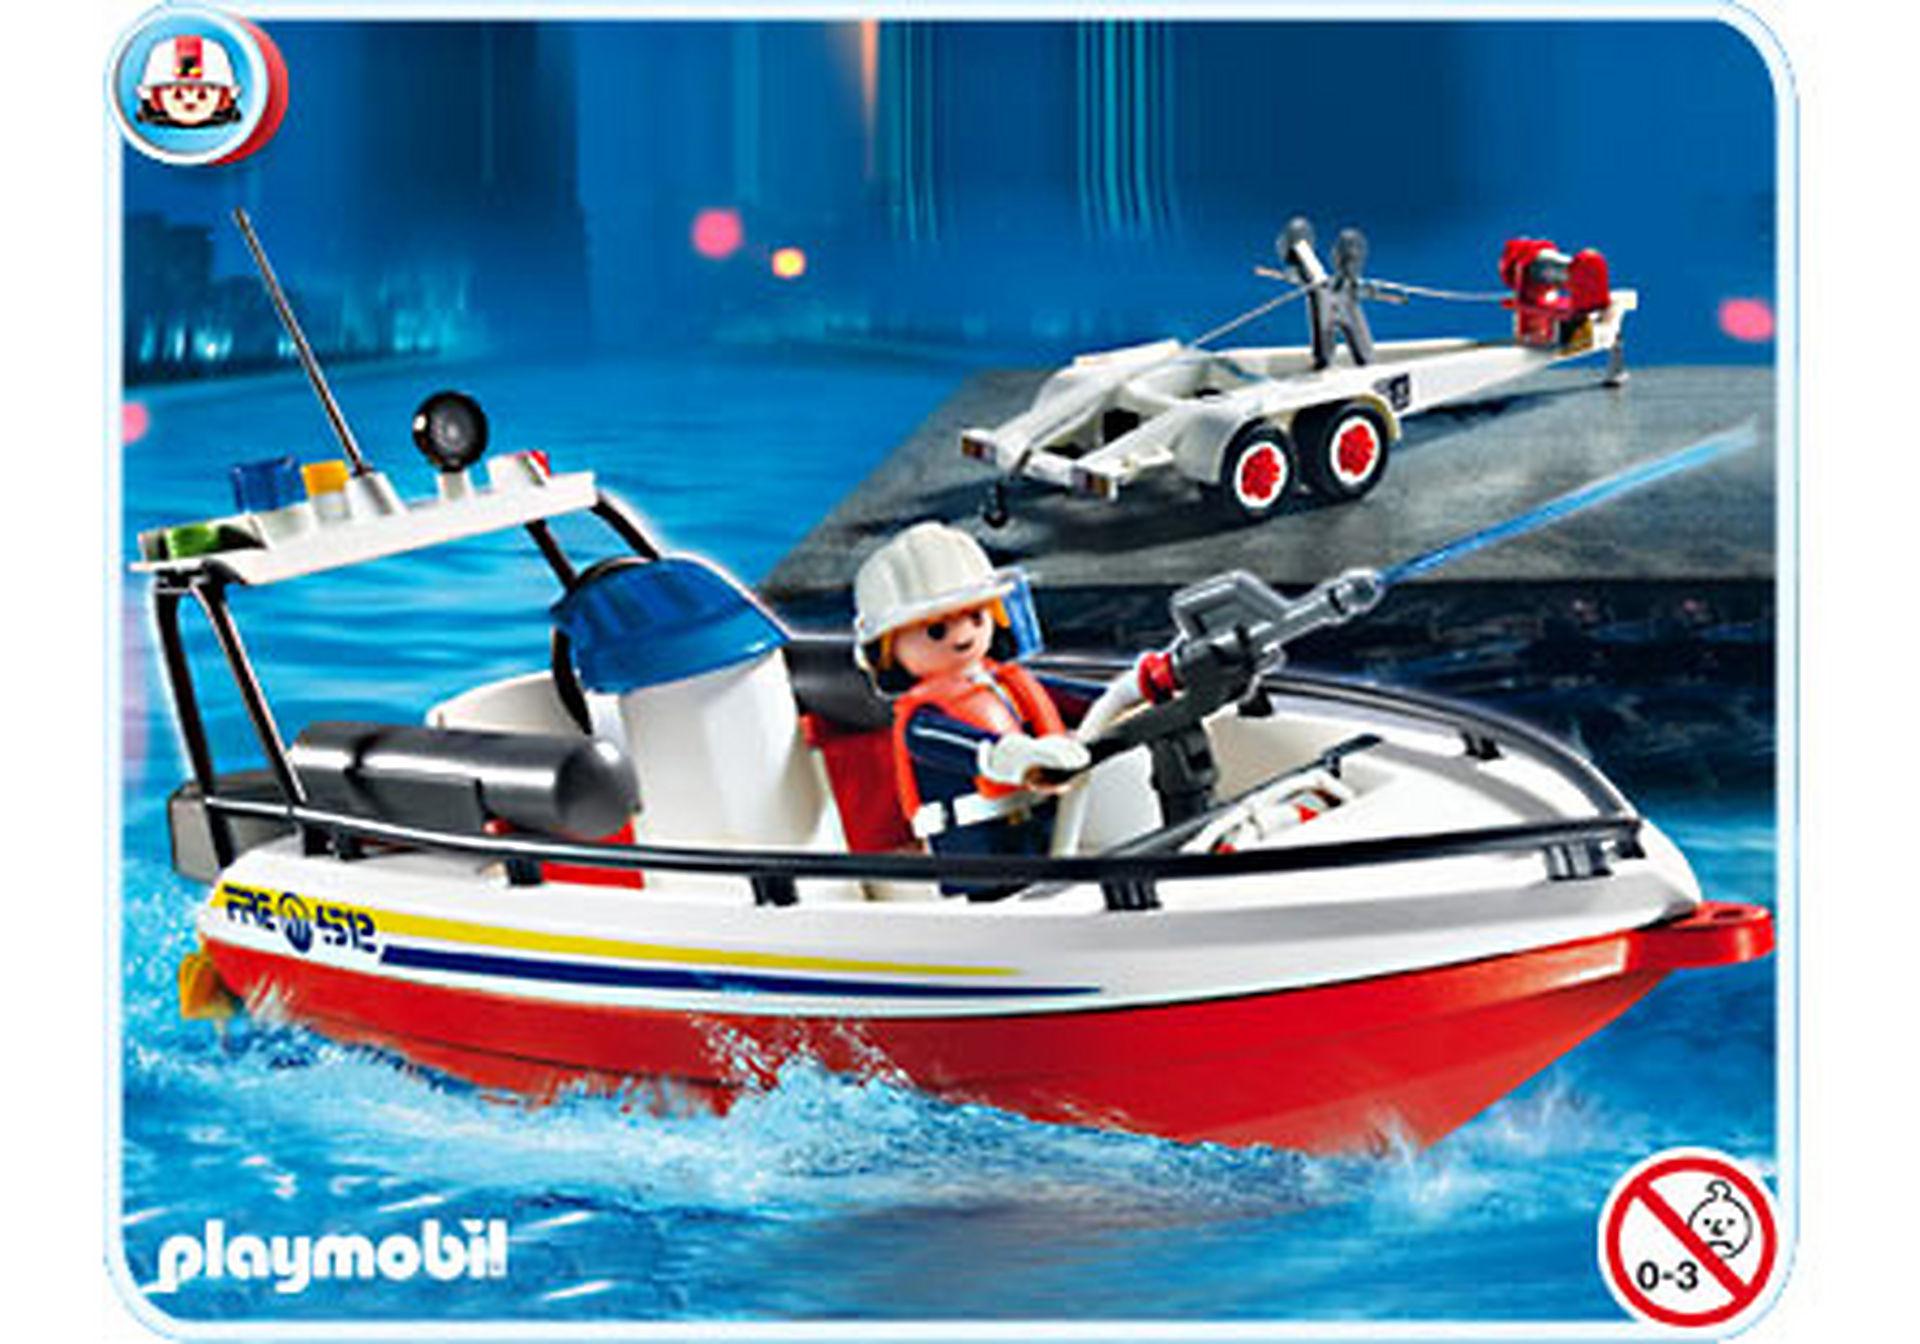 4823-A Feuerwehrboot zoom image1